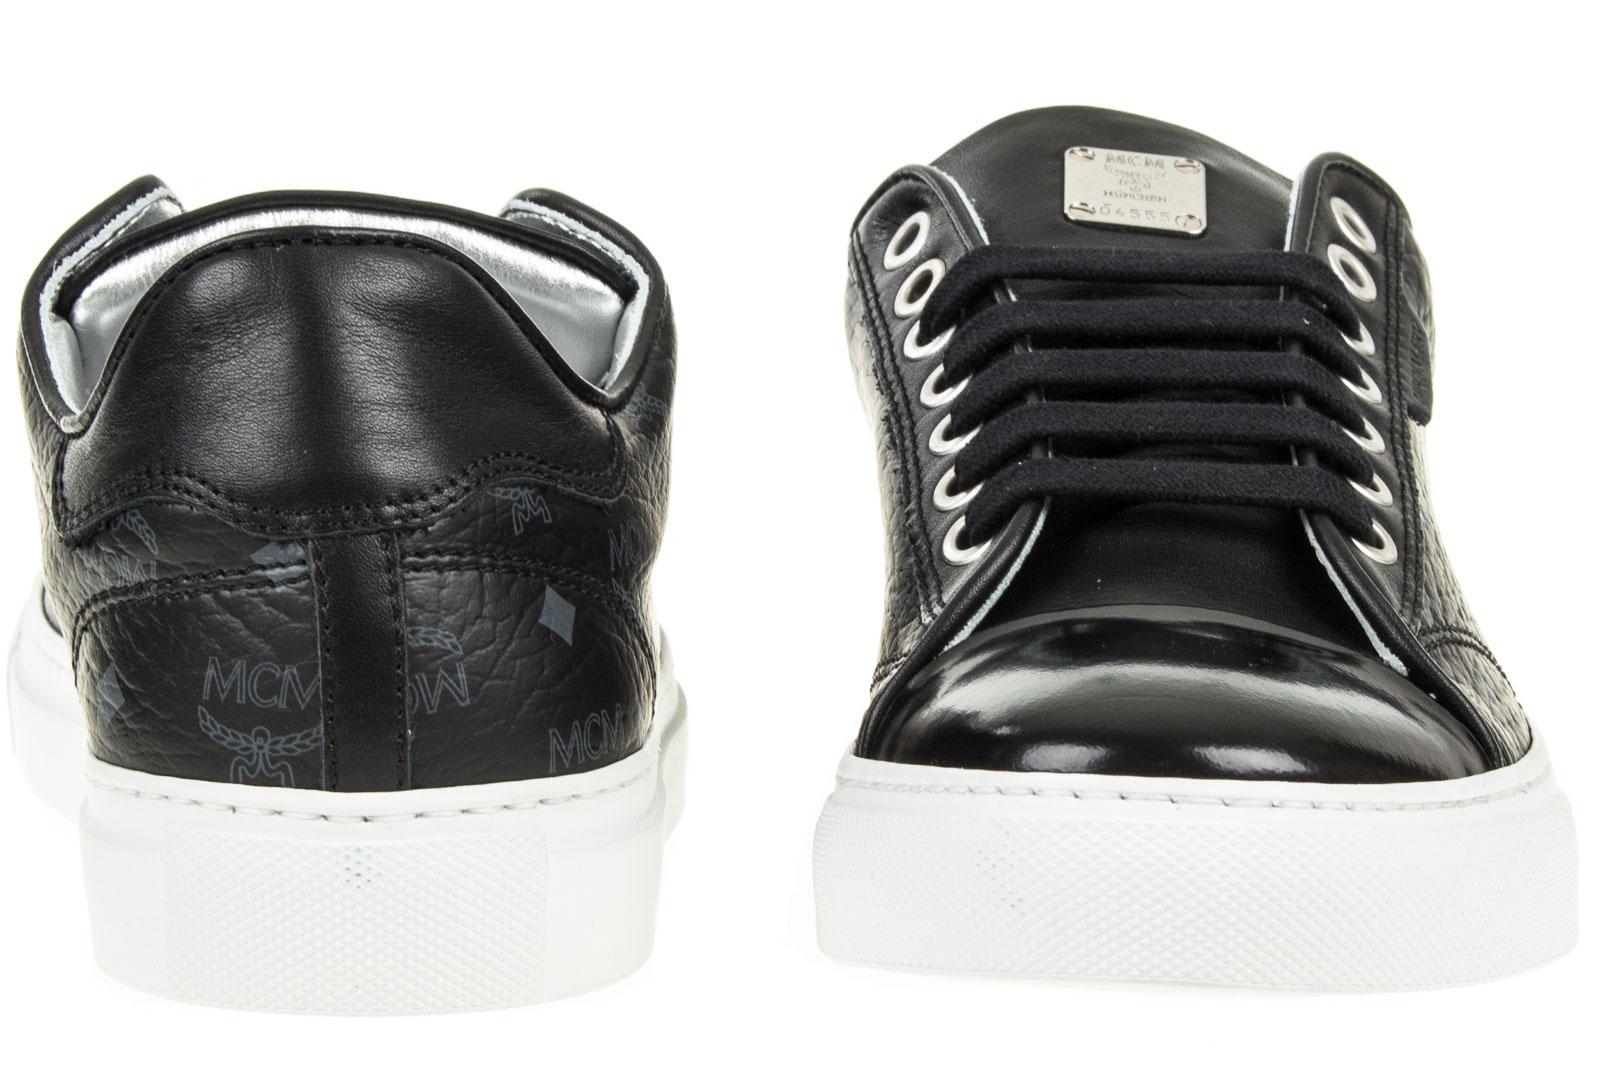 baudach schuster mcm by michalsky sneaker iii online kaufen. Black Bedroom Furniture Sets. Home Design Ideas